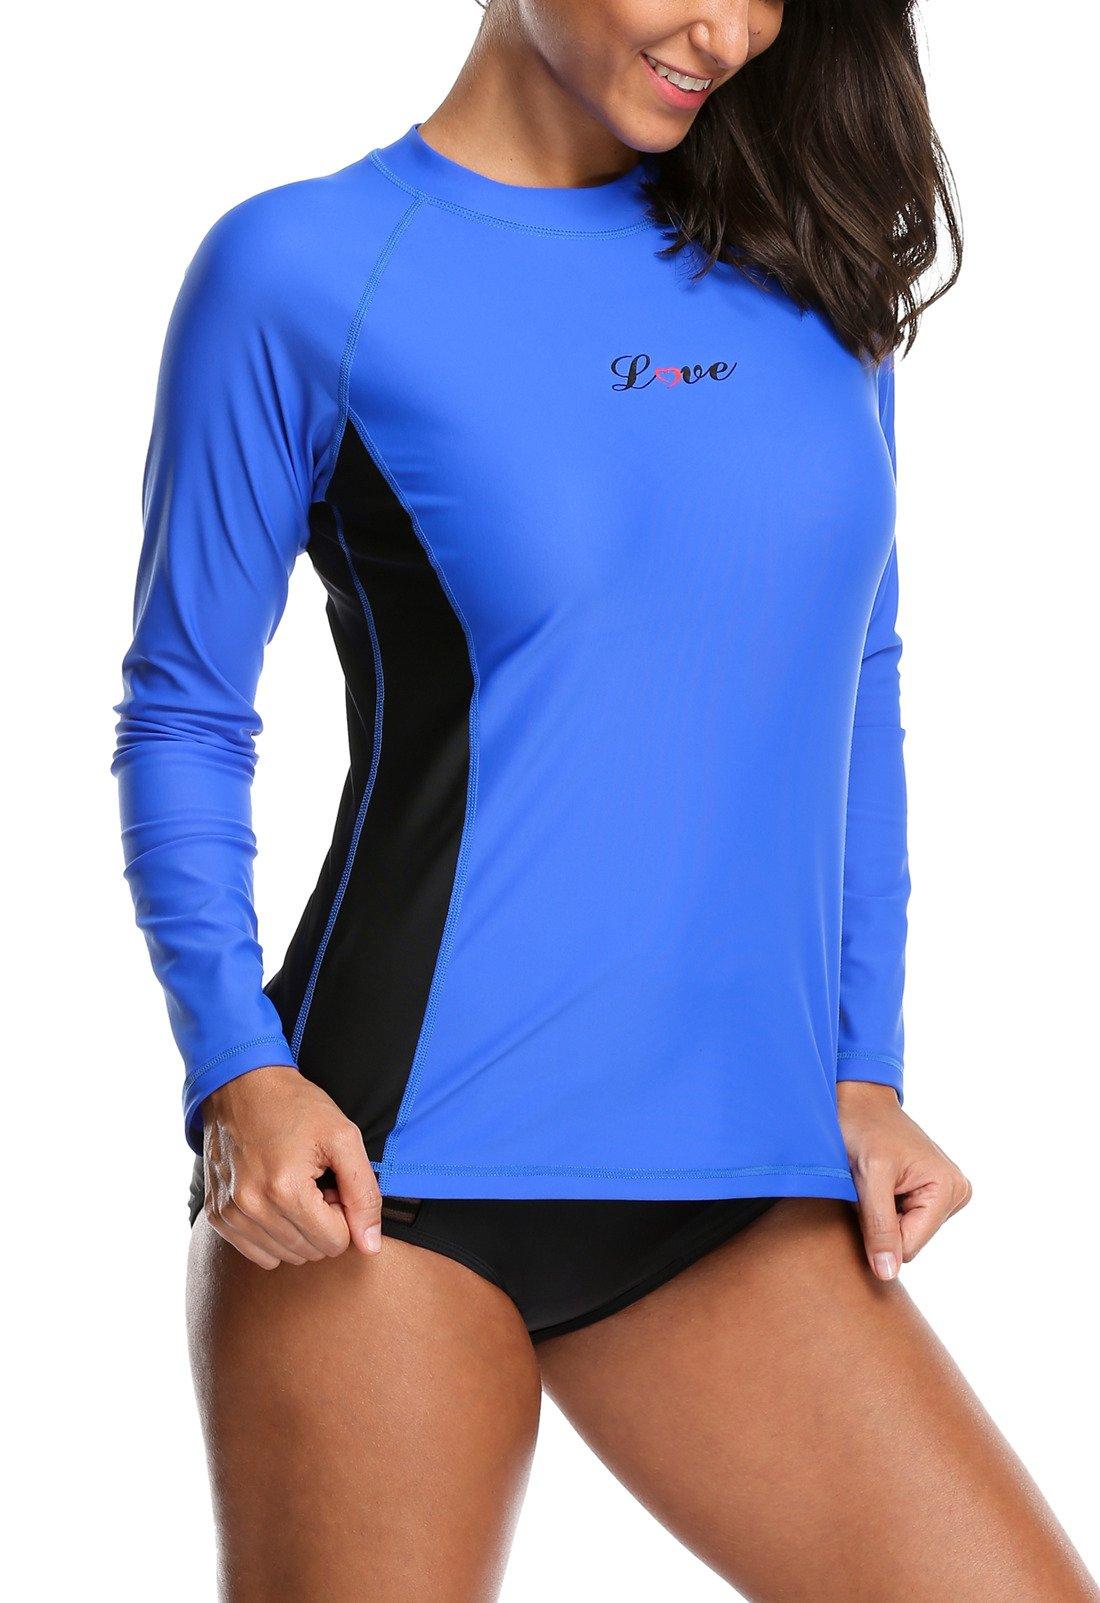 ALove Surf Shirt Rash Guard UPF 50 Athletic Top Womens Surf Rashguard Long Sleeve Medium by ALove (Image #3)